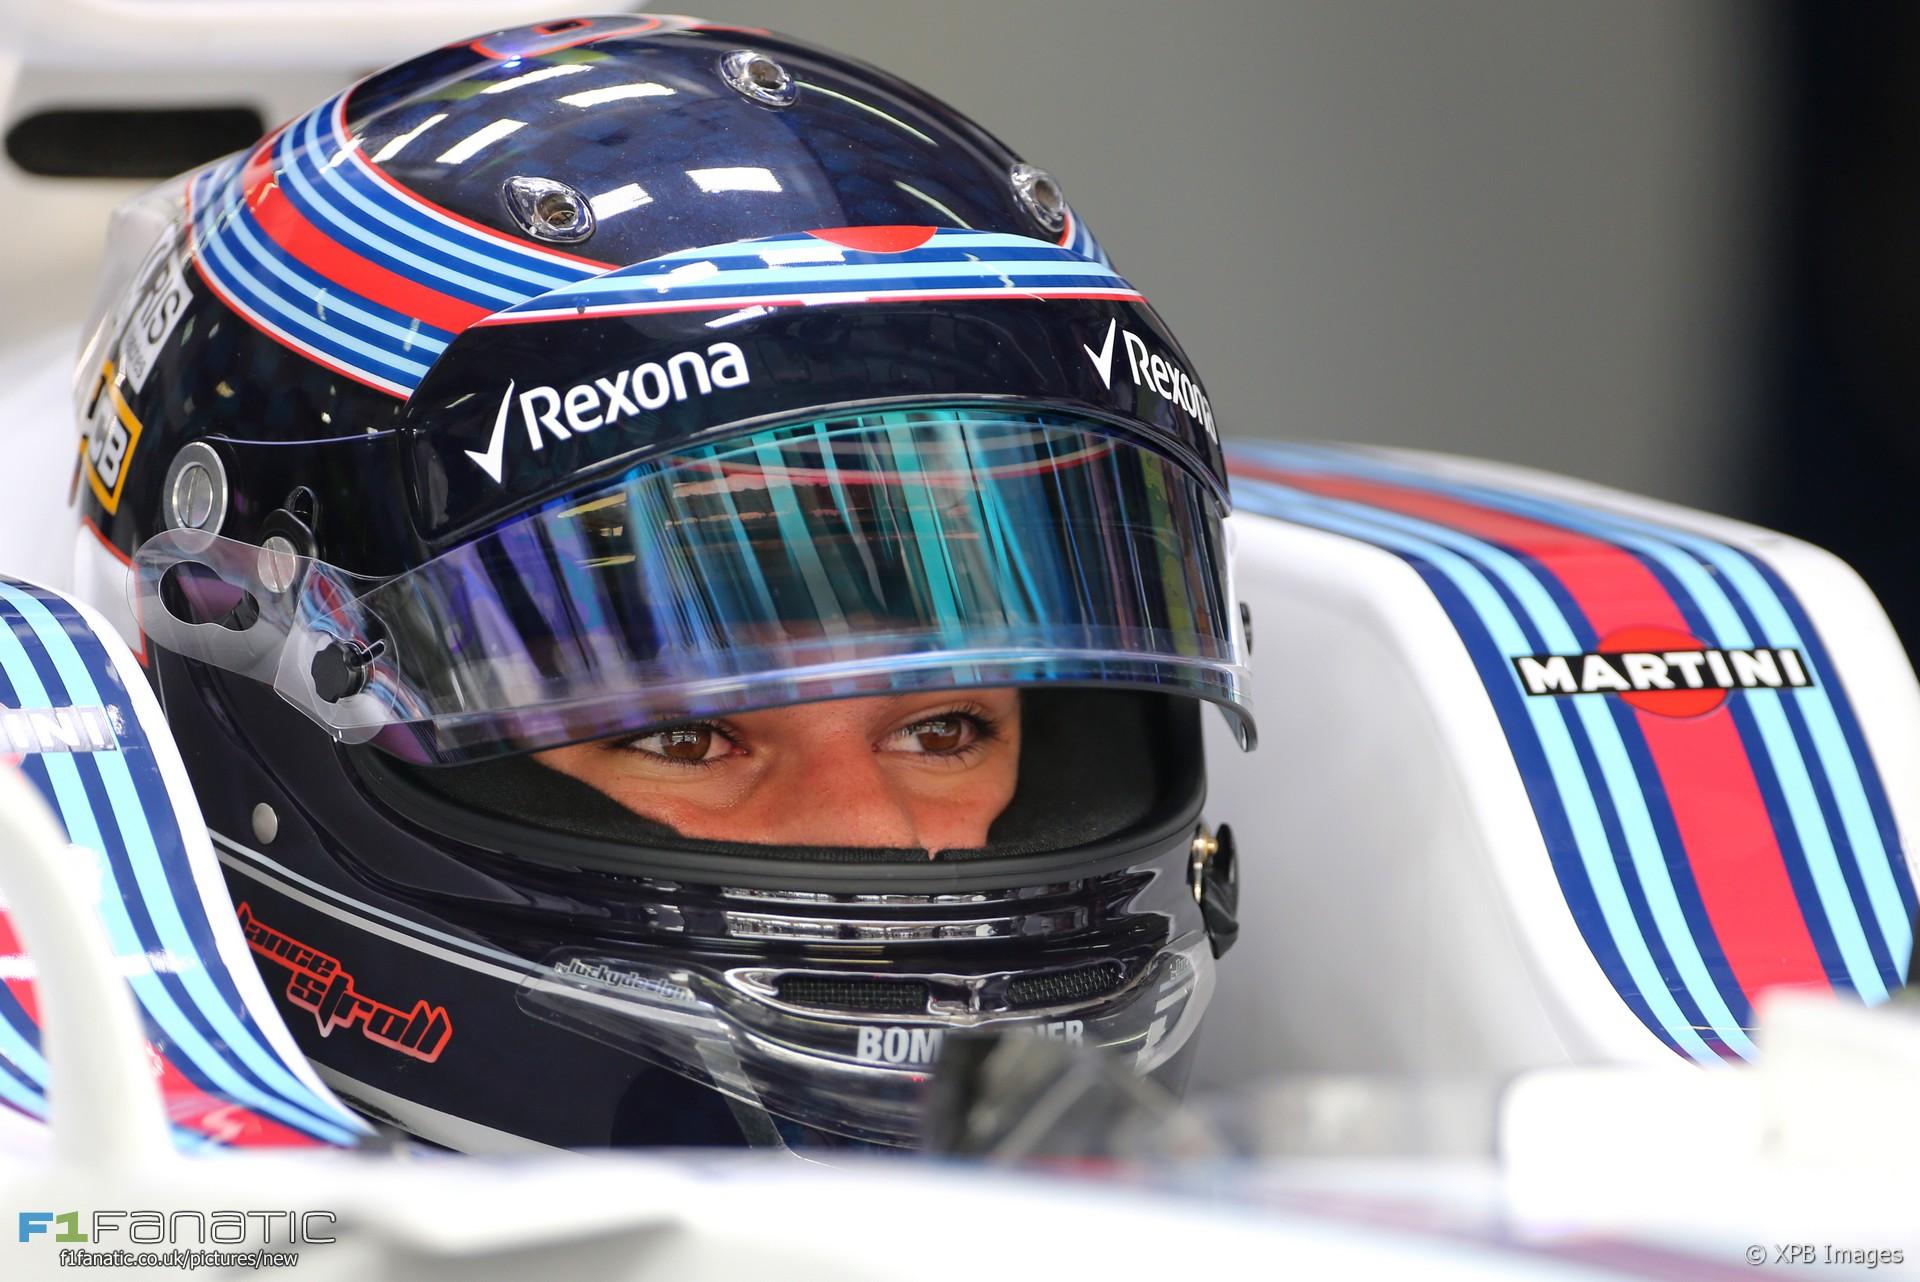 Lance Stroll, Williams, Sepang International Circuit, 2017